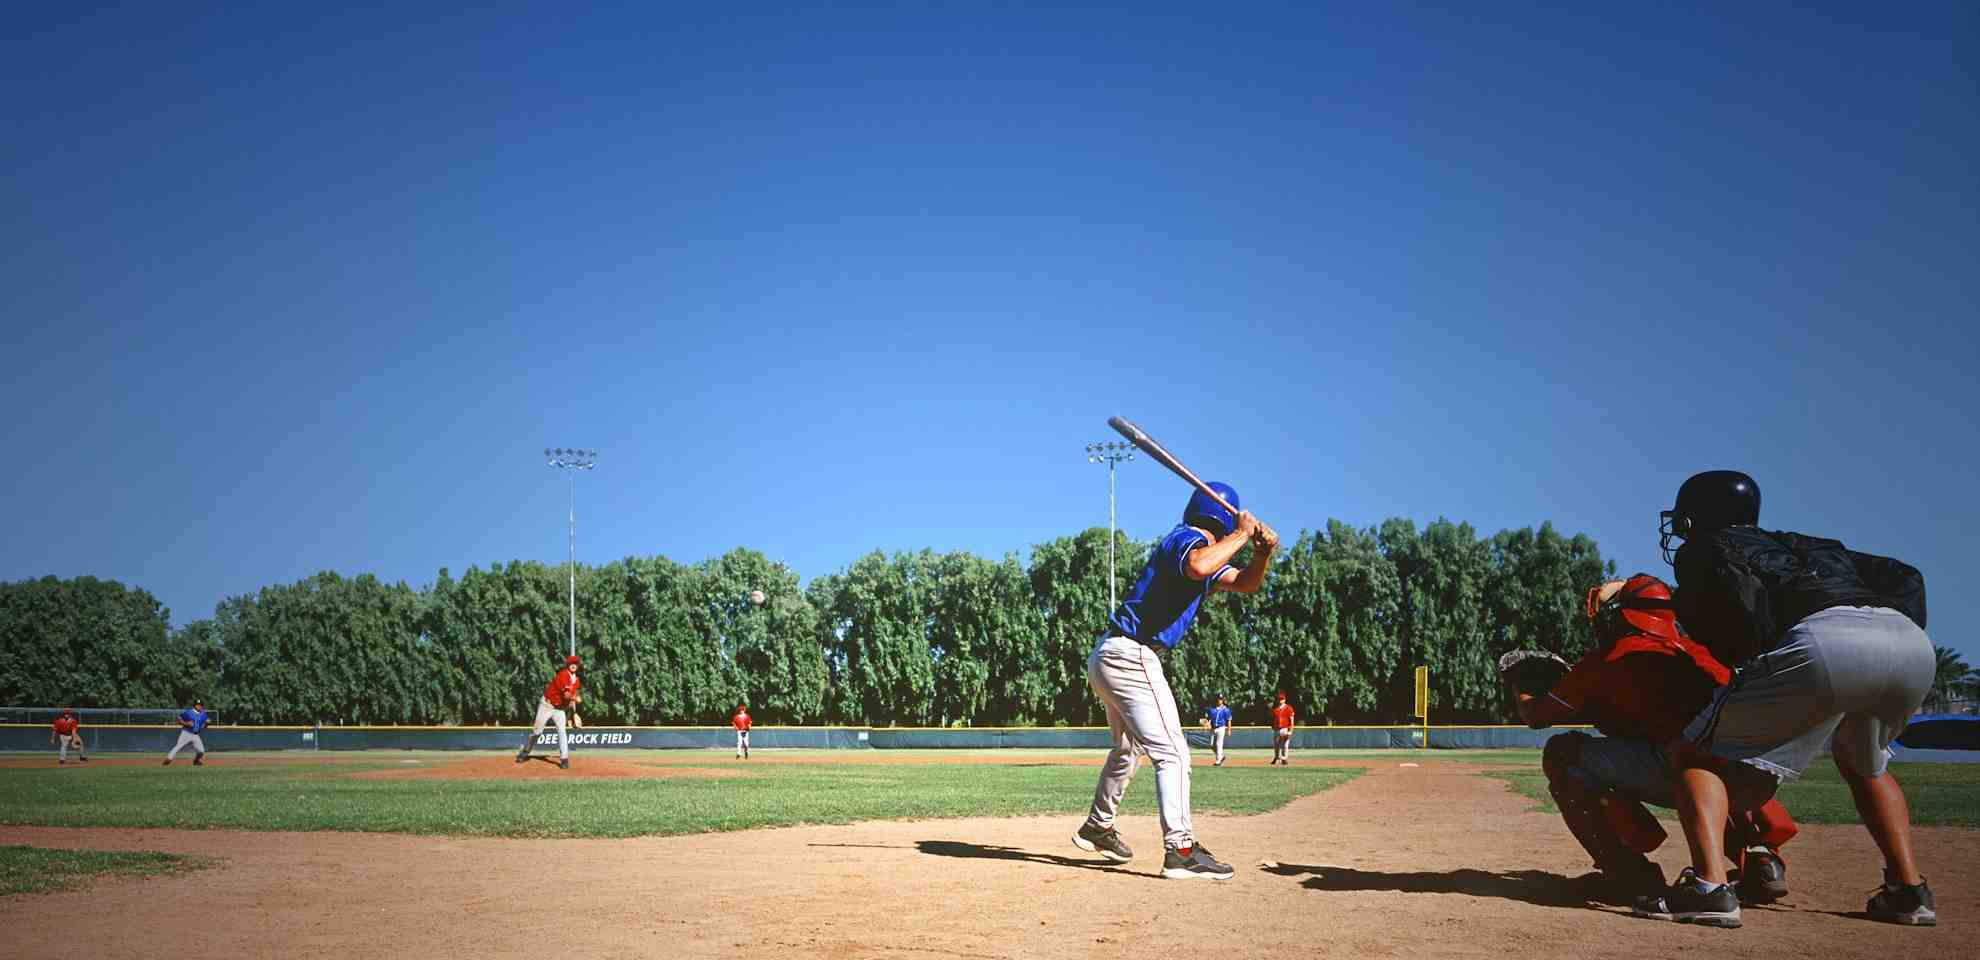 Baseball Equipment Power Hitter since 1919 | PW Athletic Mfg. Co.